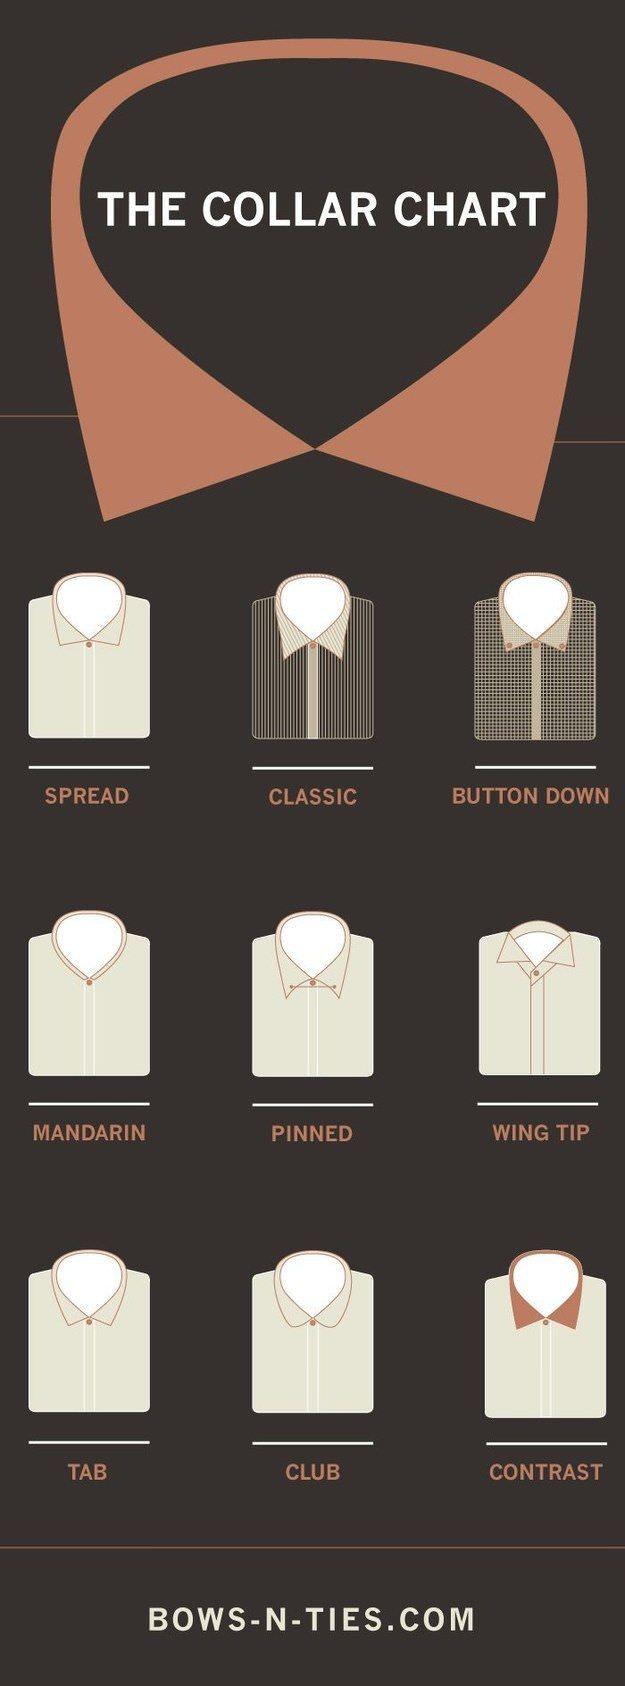 men's shirt collar types, different collar types